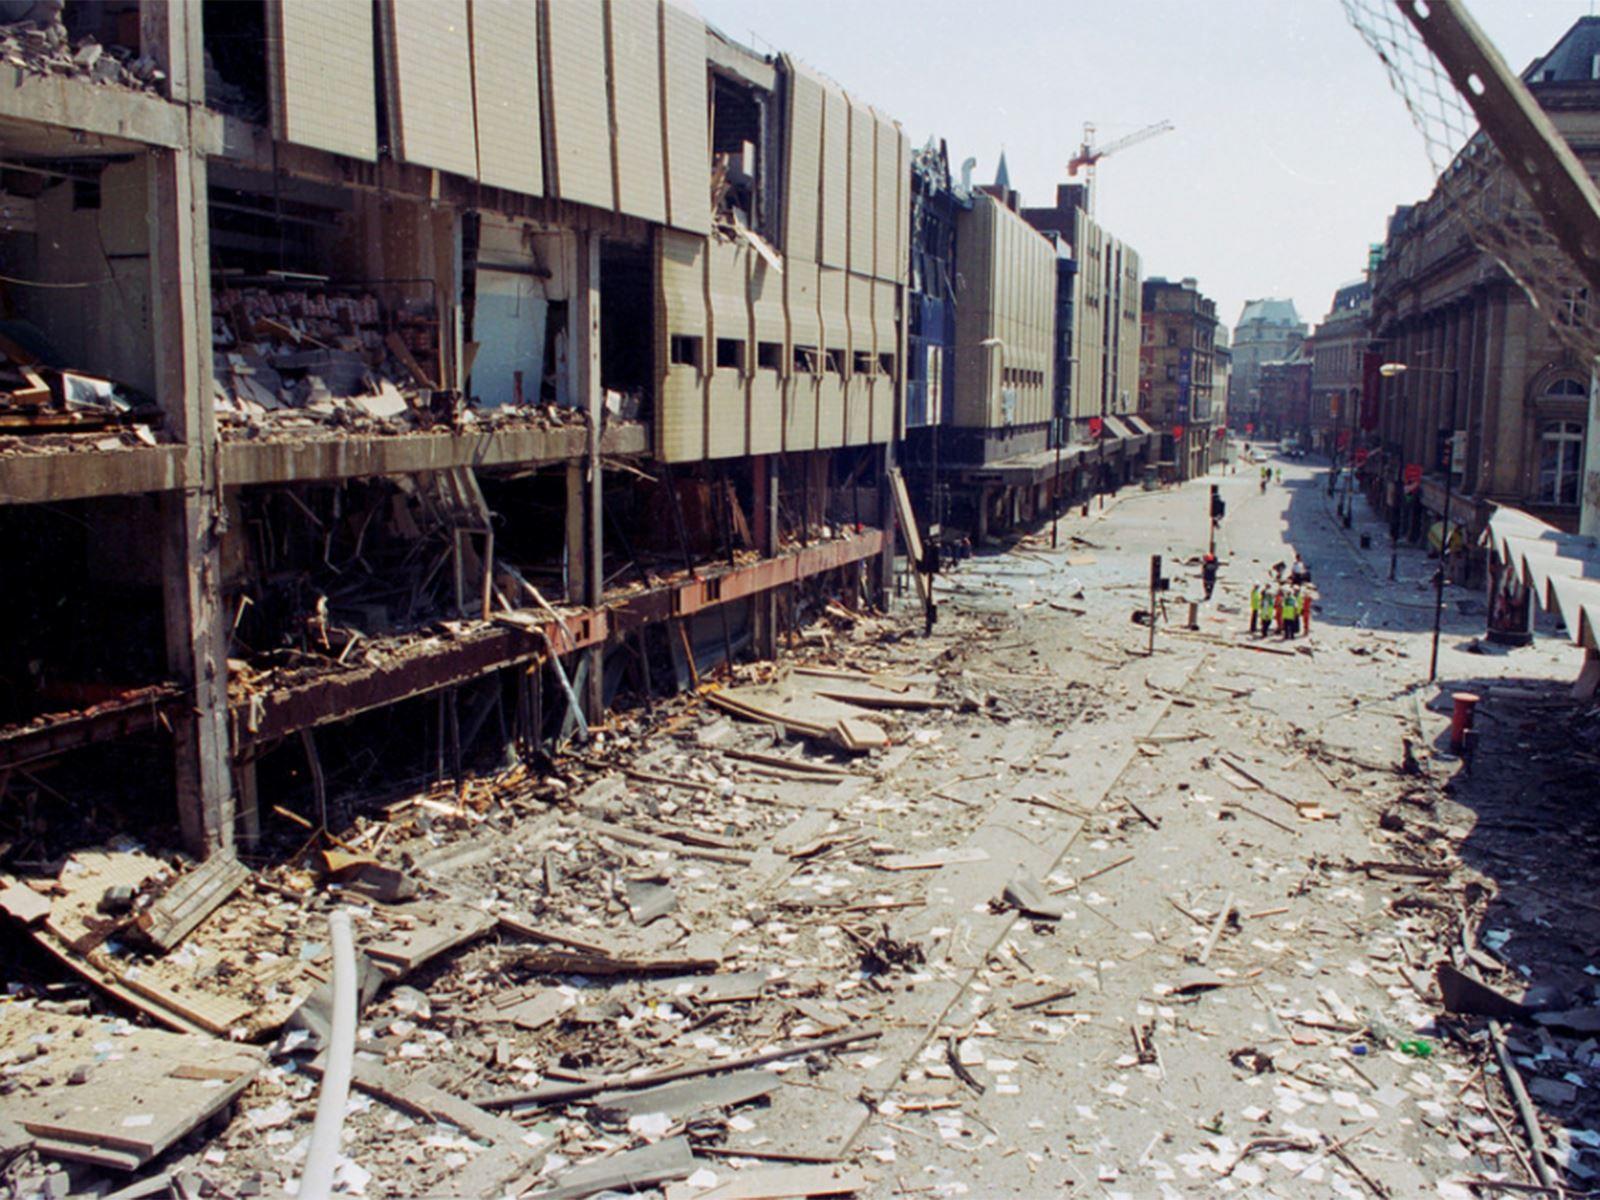 25 years ago, the IRA detonated a 1,500-kilogram lorry bomb on Corporation Street, The Manc